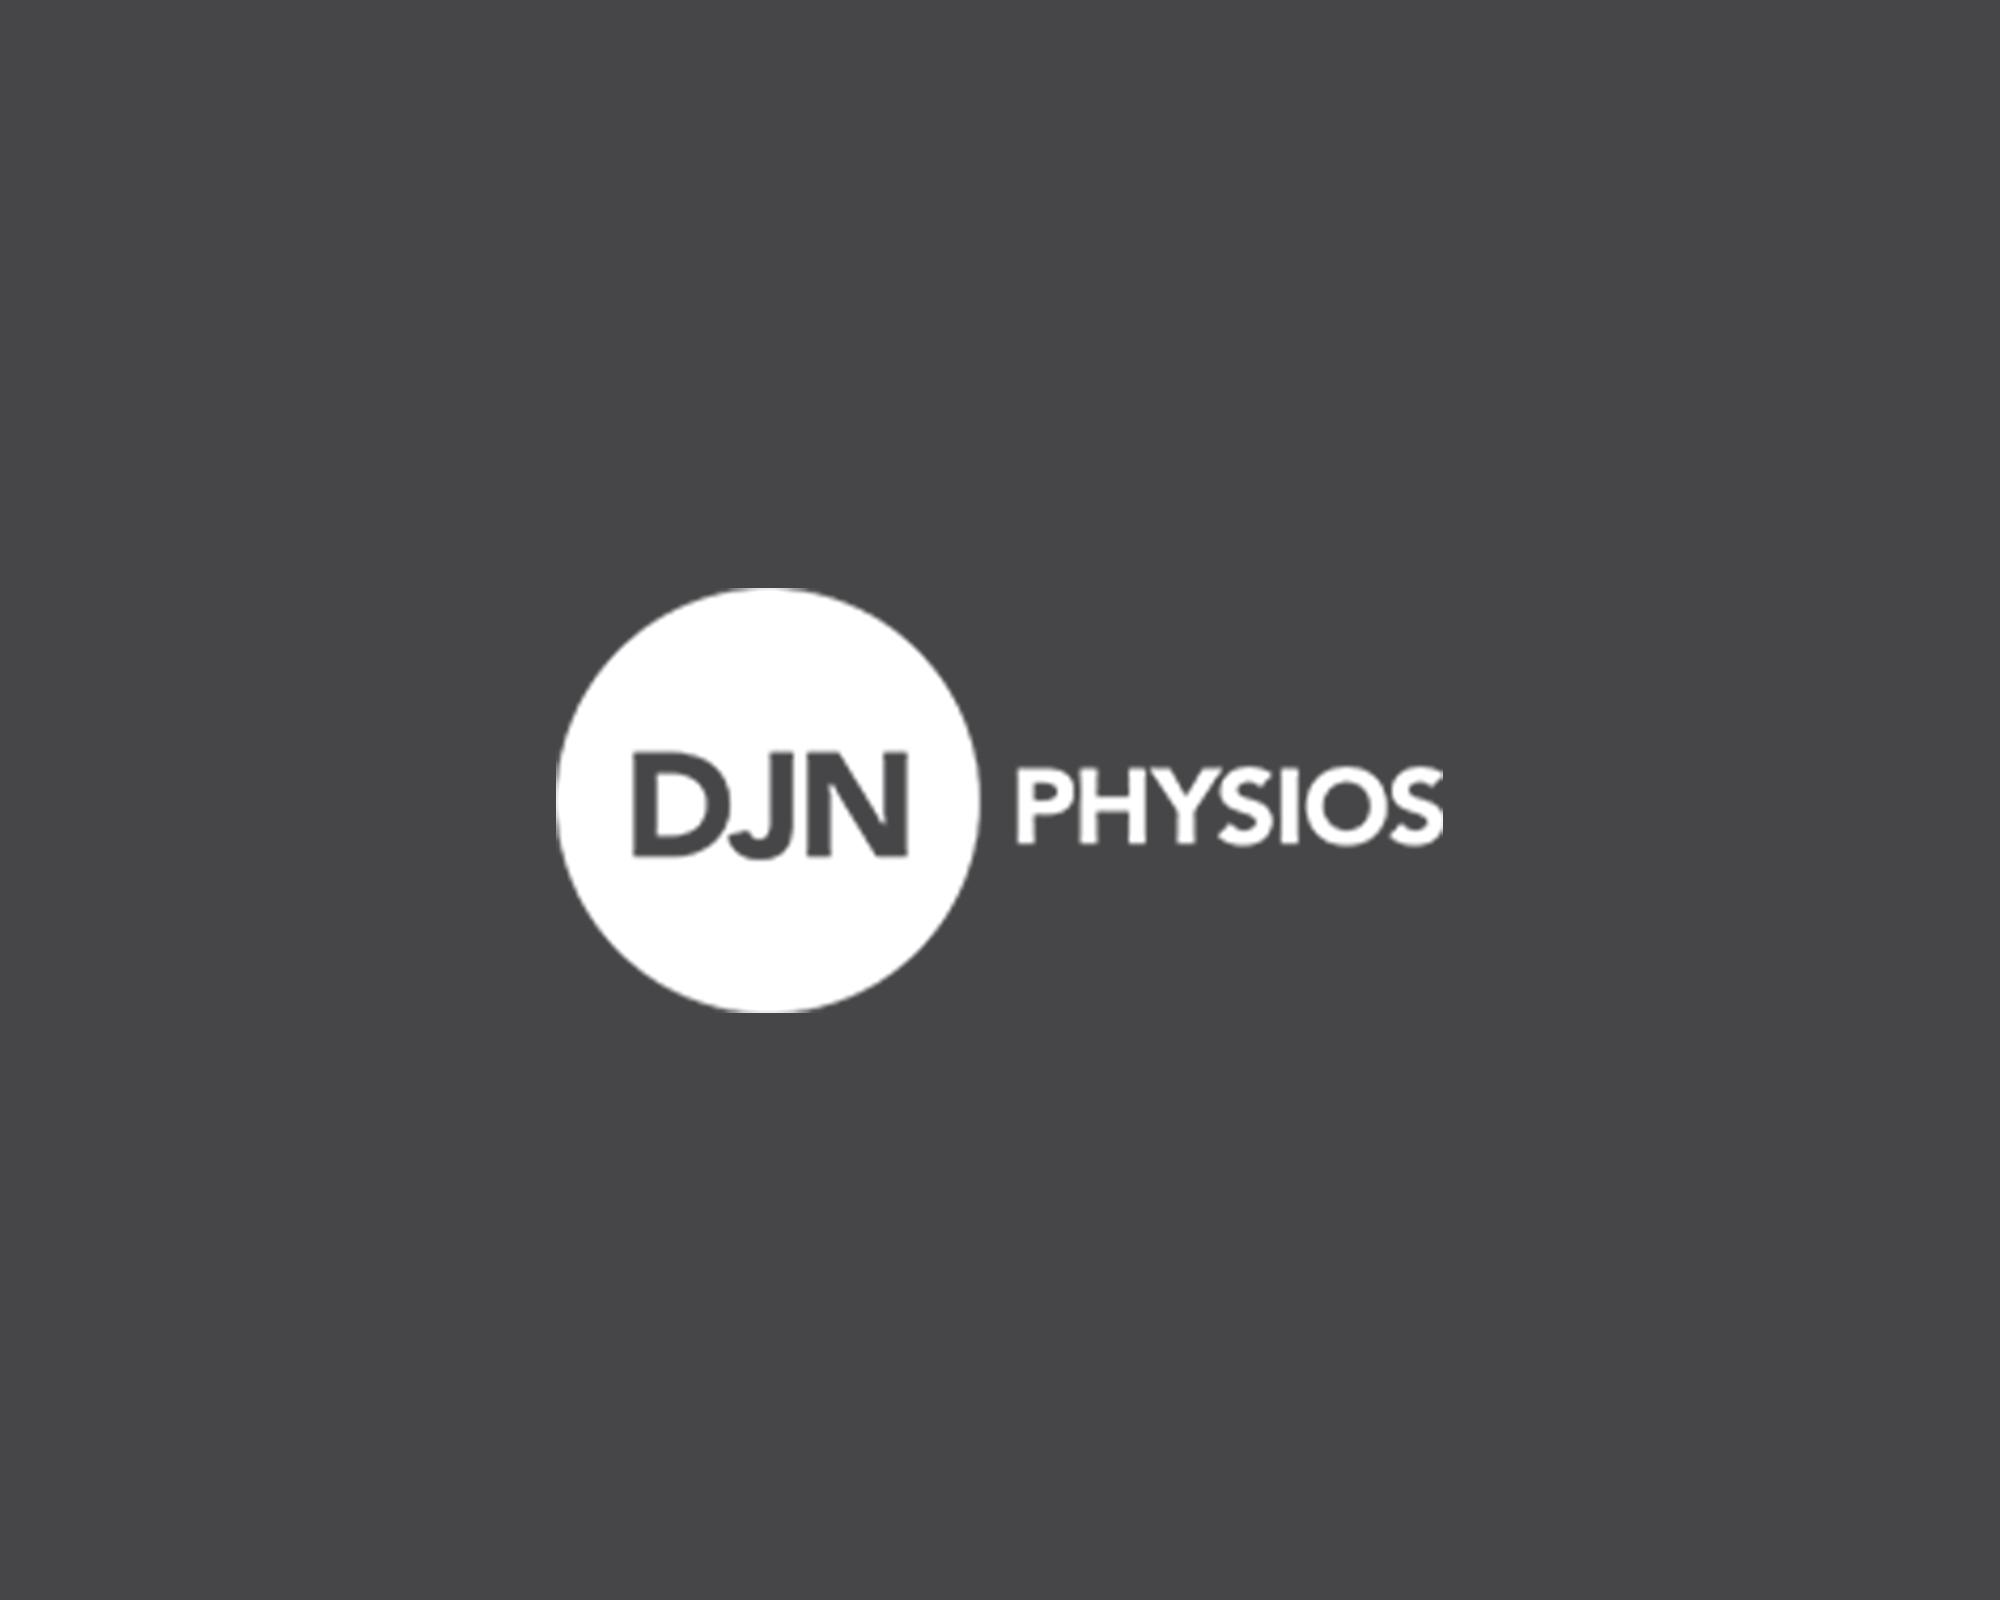 djn physios Logo